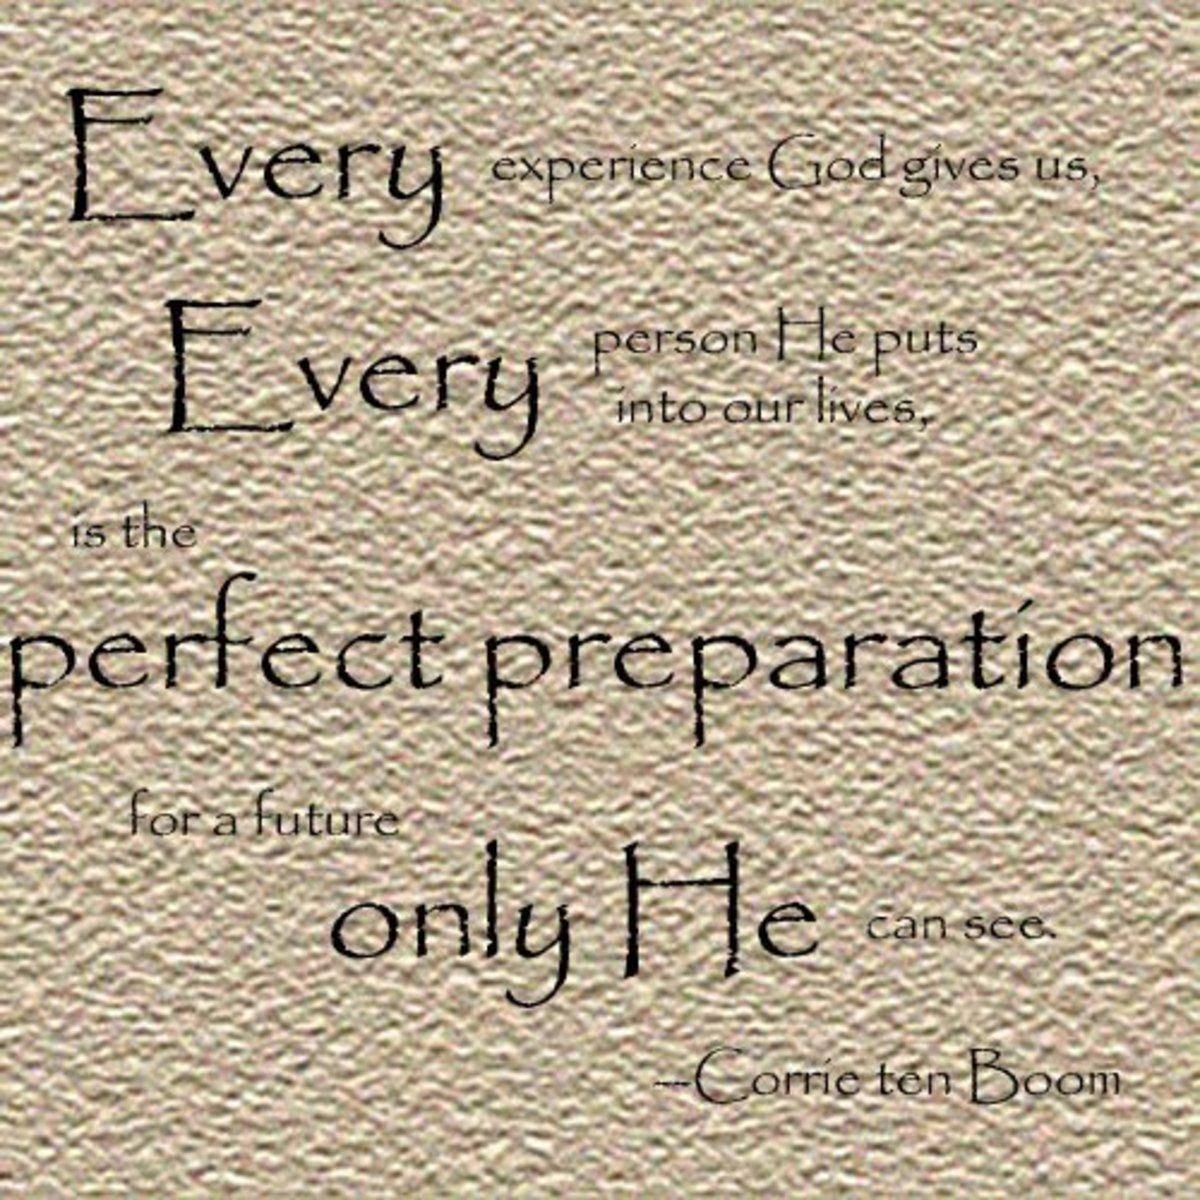 places-of-preparation